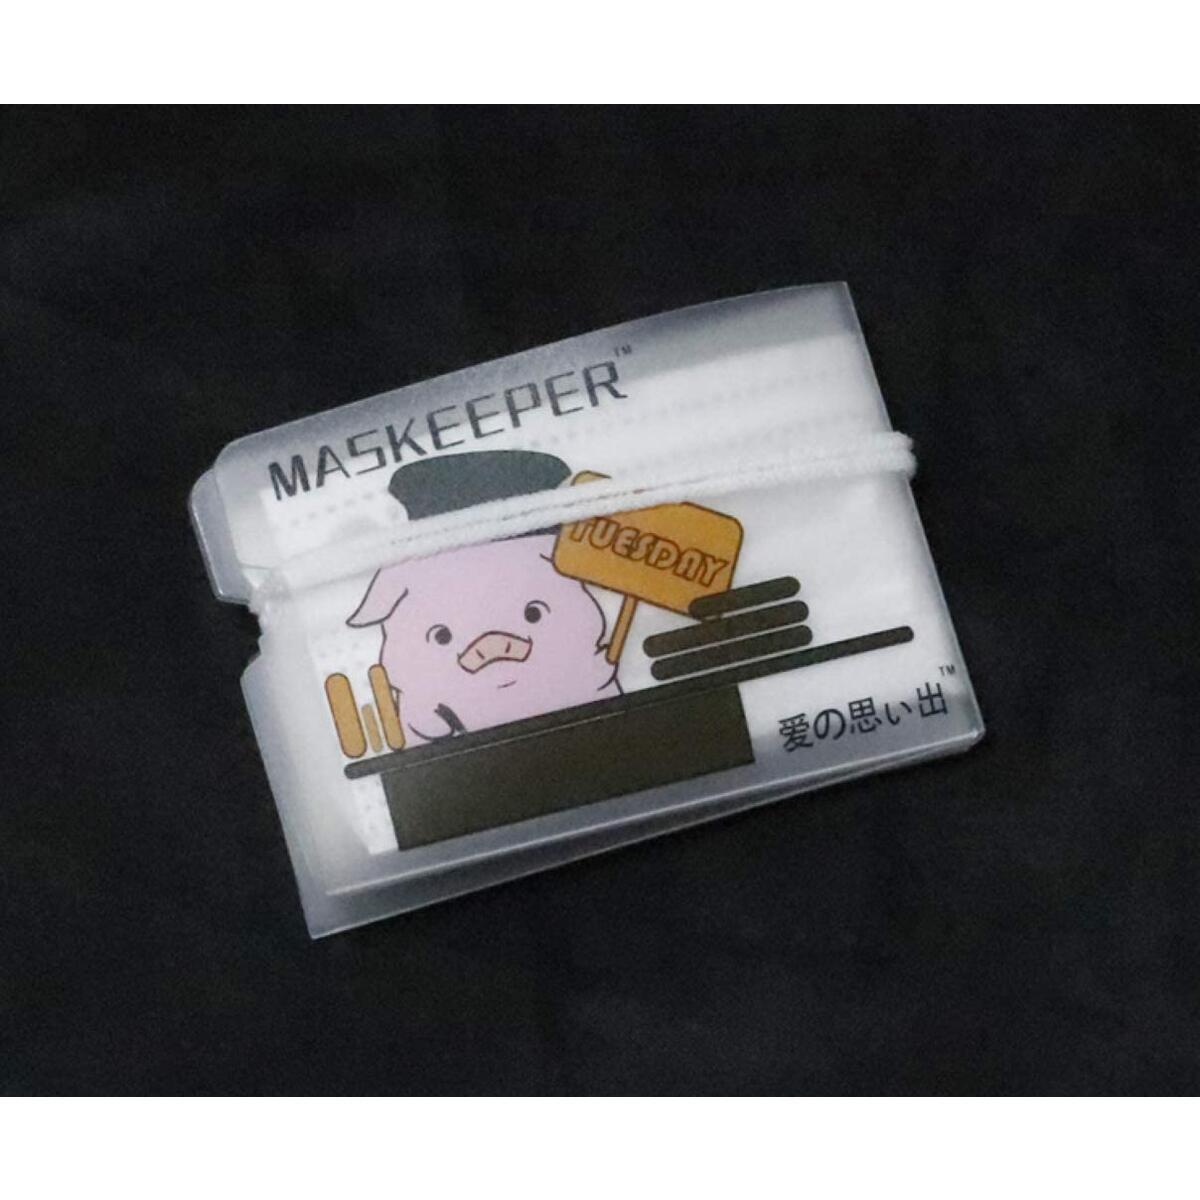 ROSEWARD Japan Made Cartoon Portable Plastic Mask Storage Clip Folding Mask Keeper Plastic Case Holder Organizer 5 Pcs/Pack, COC Certified